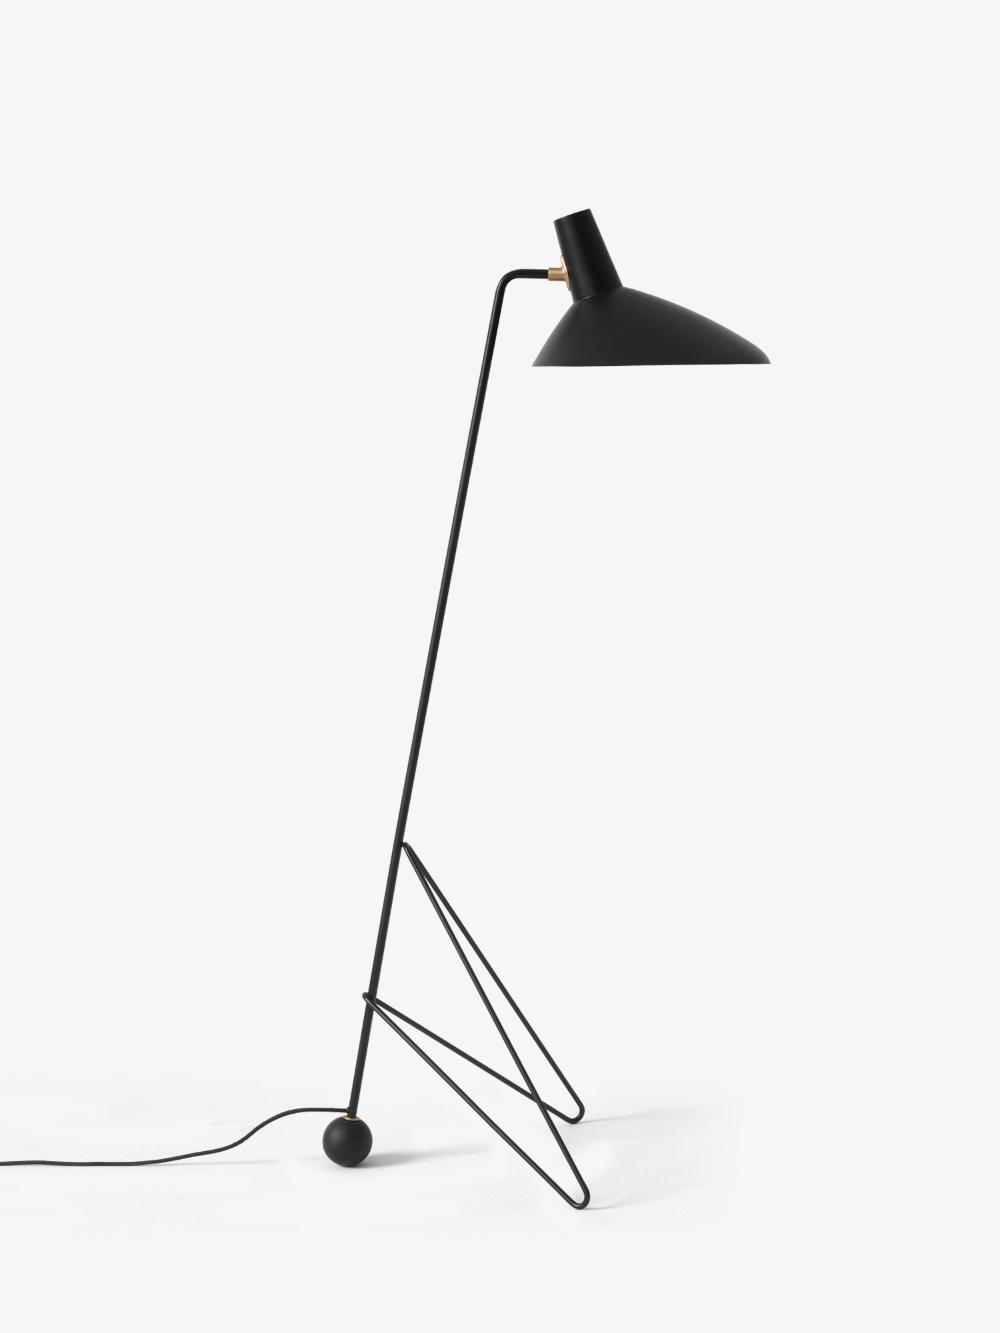 Tradition Tripod Hm8 In 2020 Floor Lamp Lamp Floor Lamps Living Room